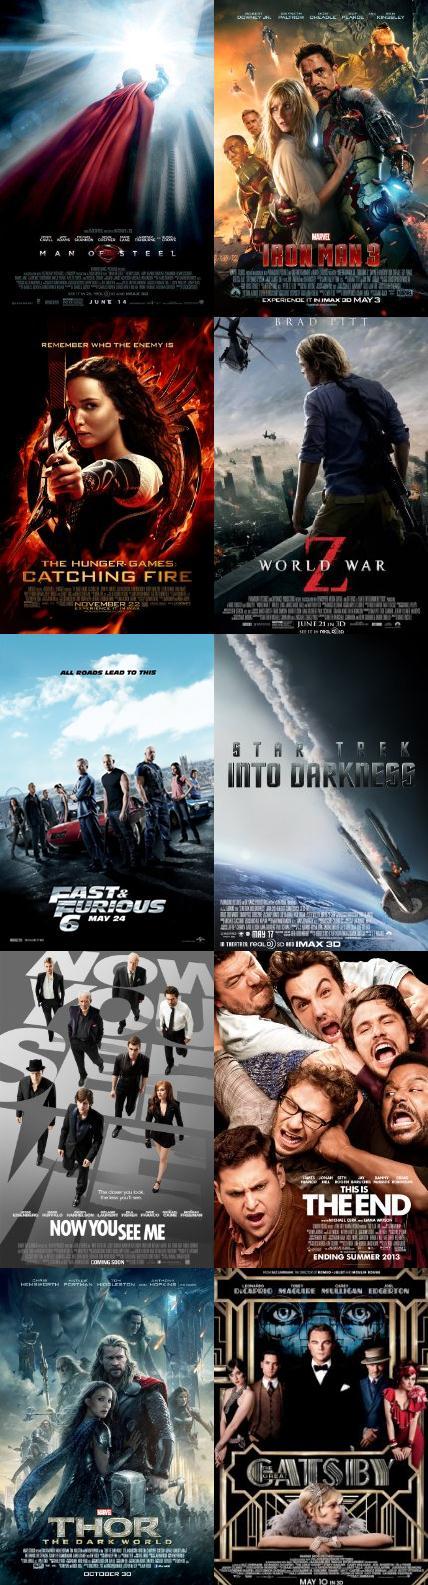 IMDb-Top-10-Movies-of-2013